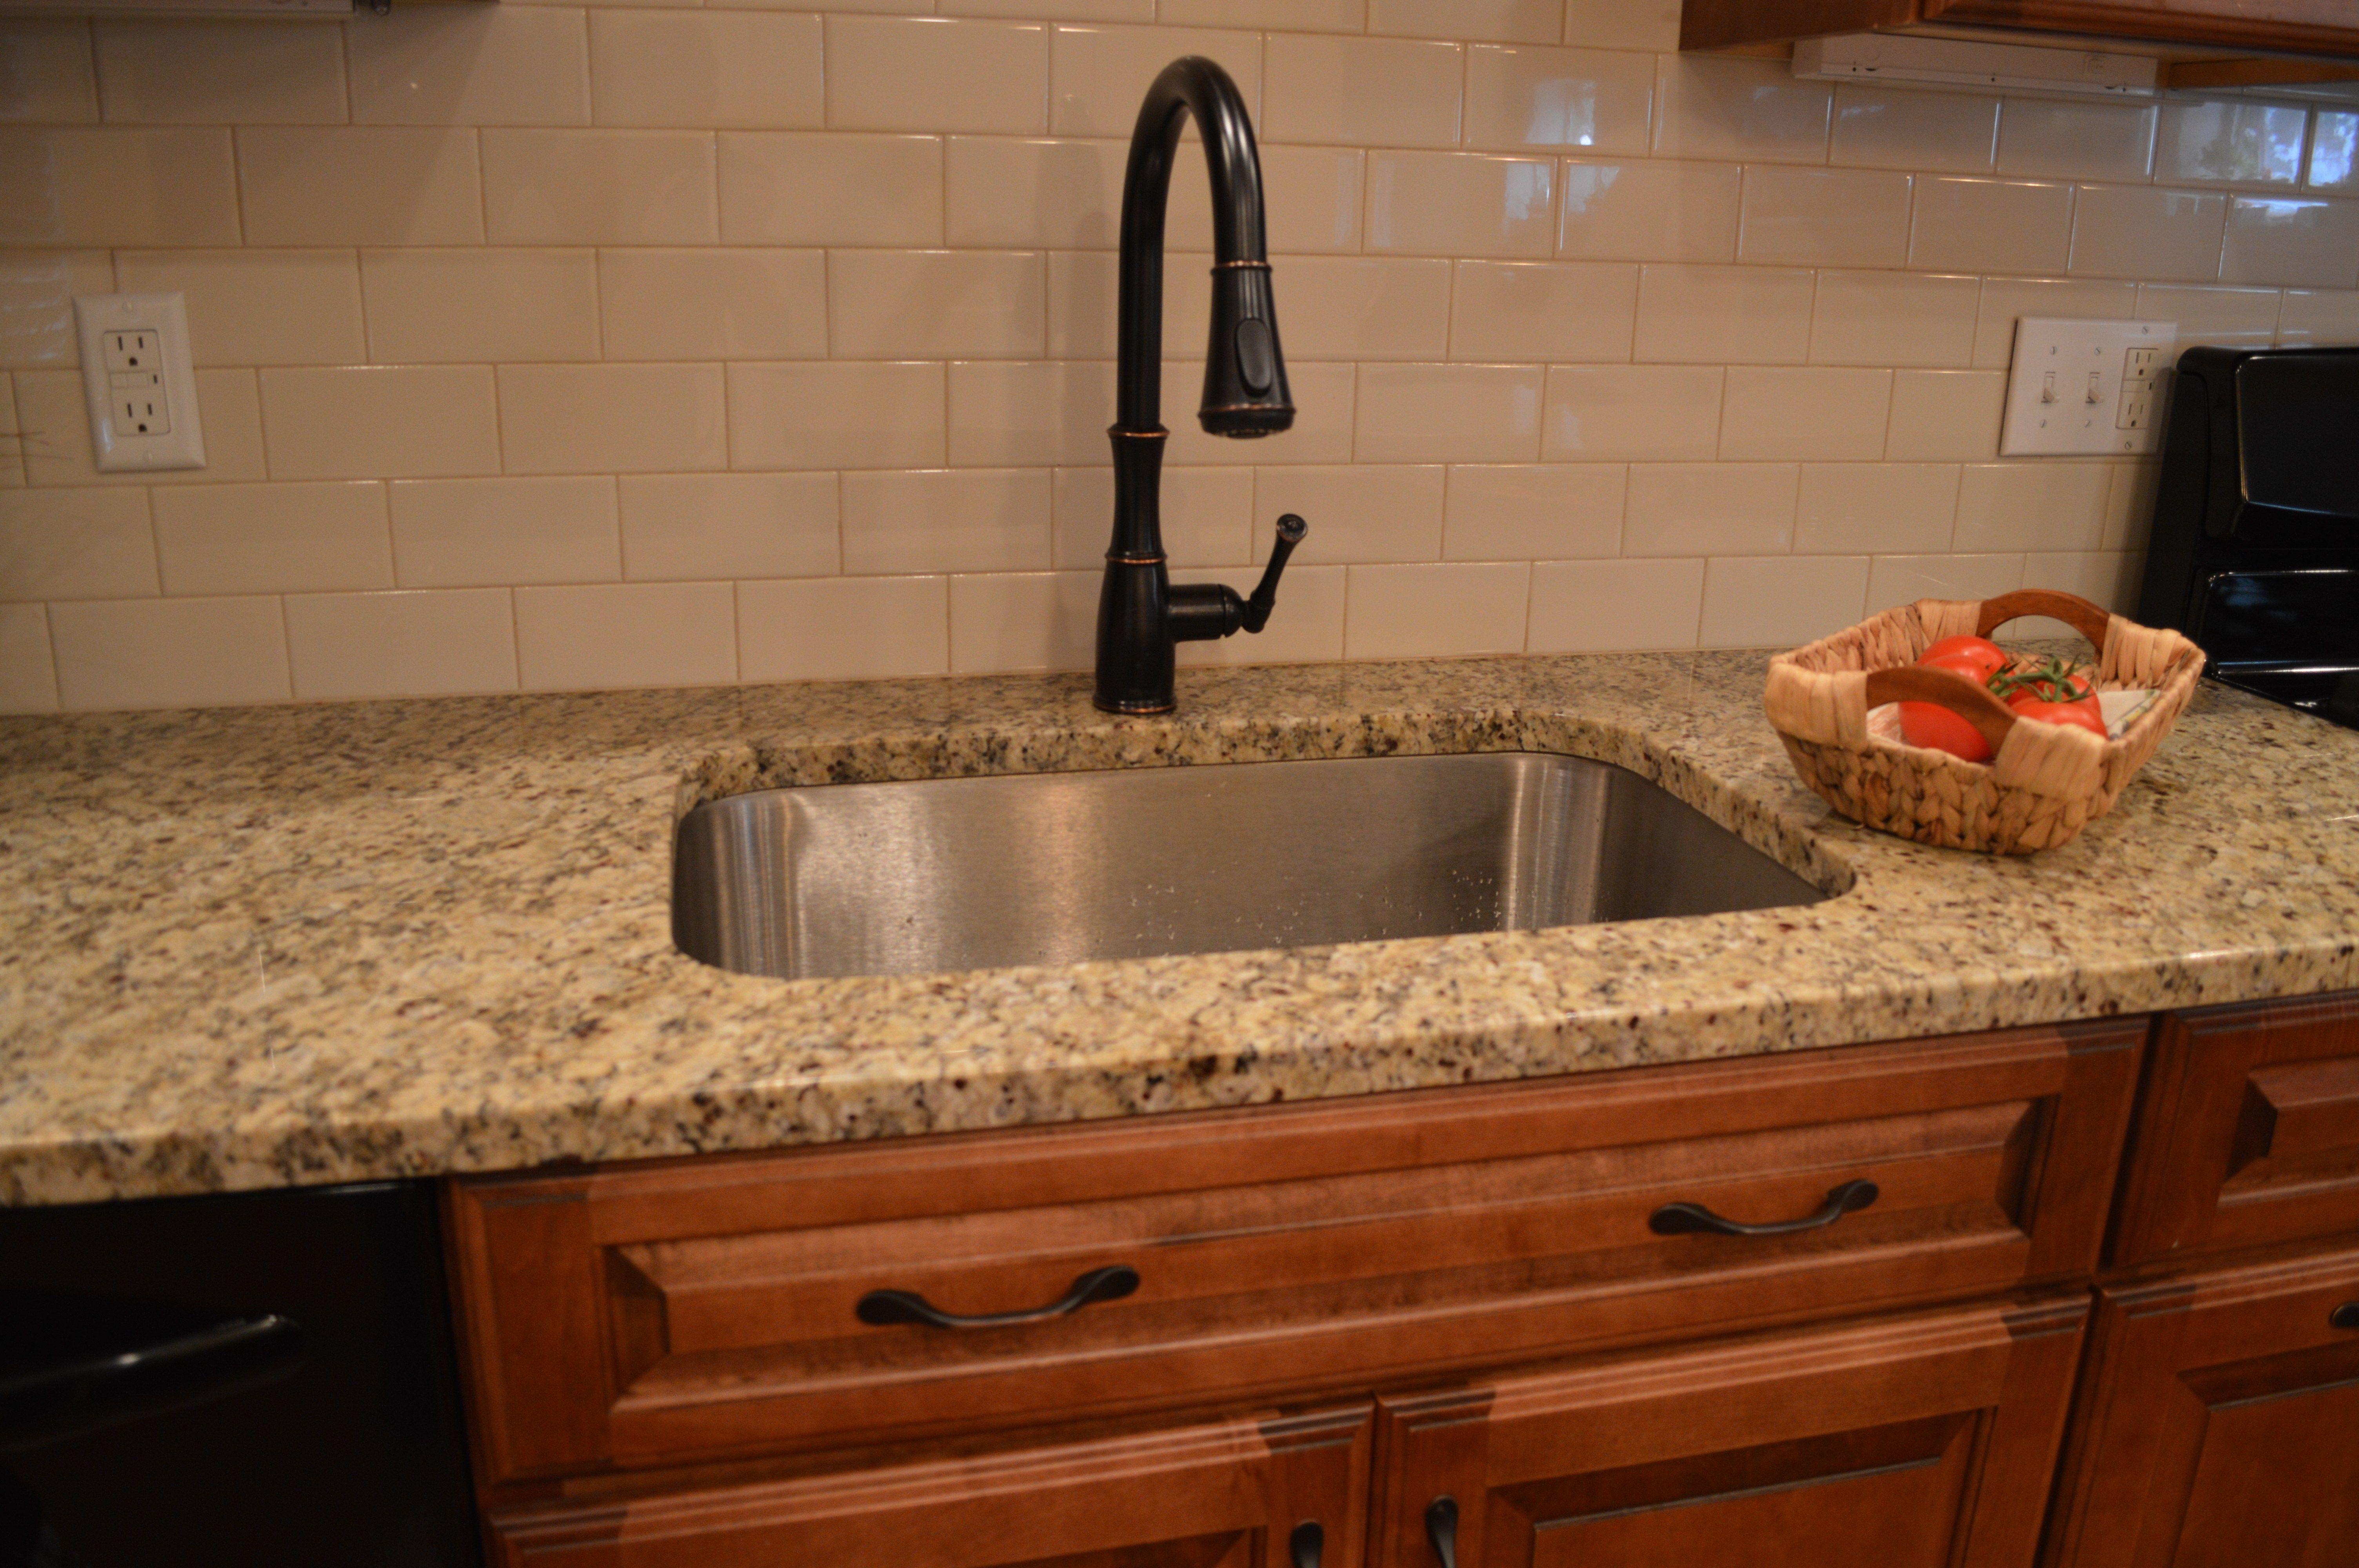 Kitchen counter backsplash height kitchen backsplash tile ideas